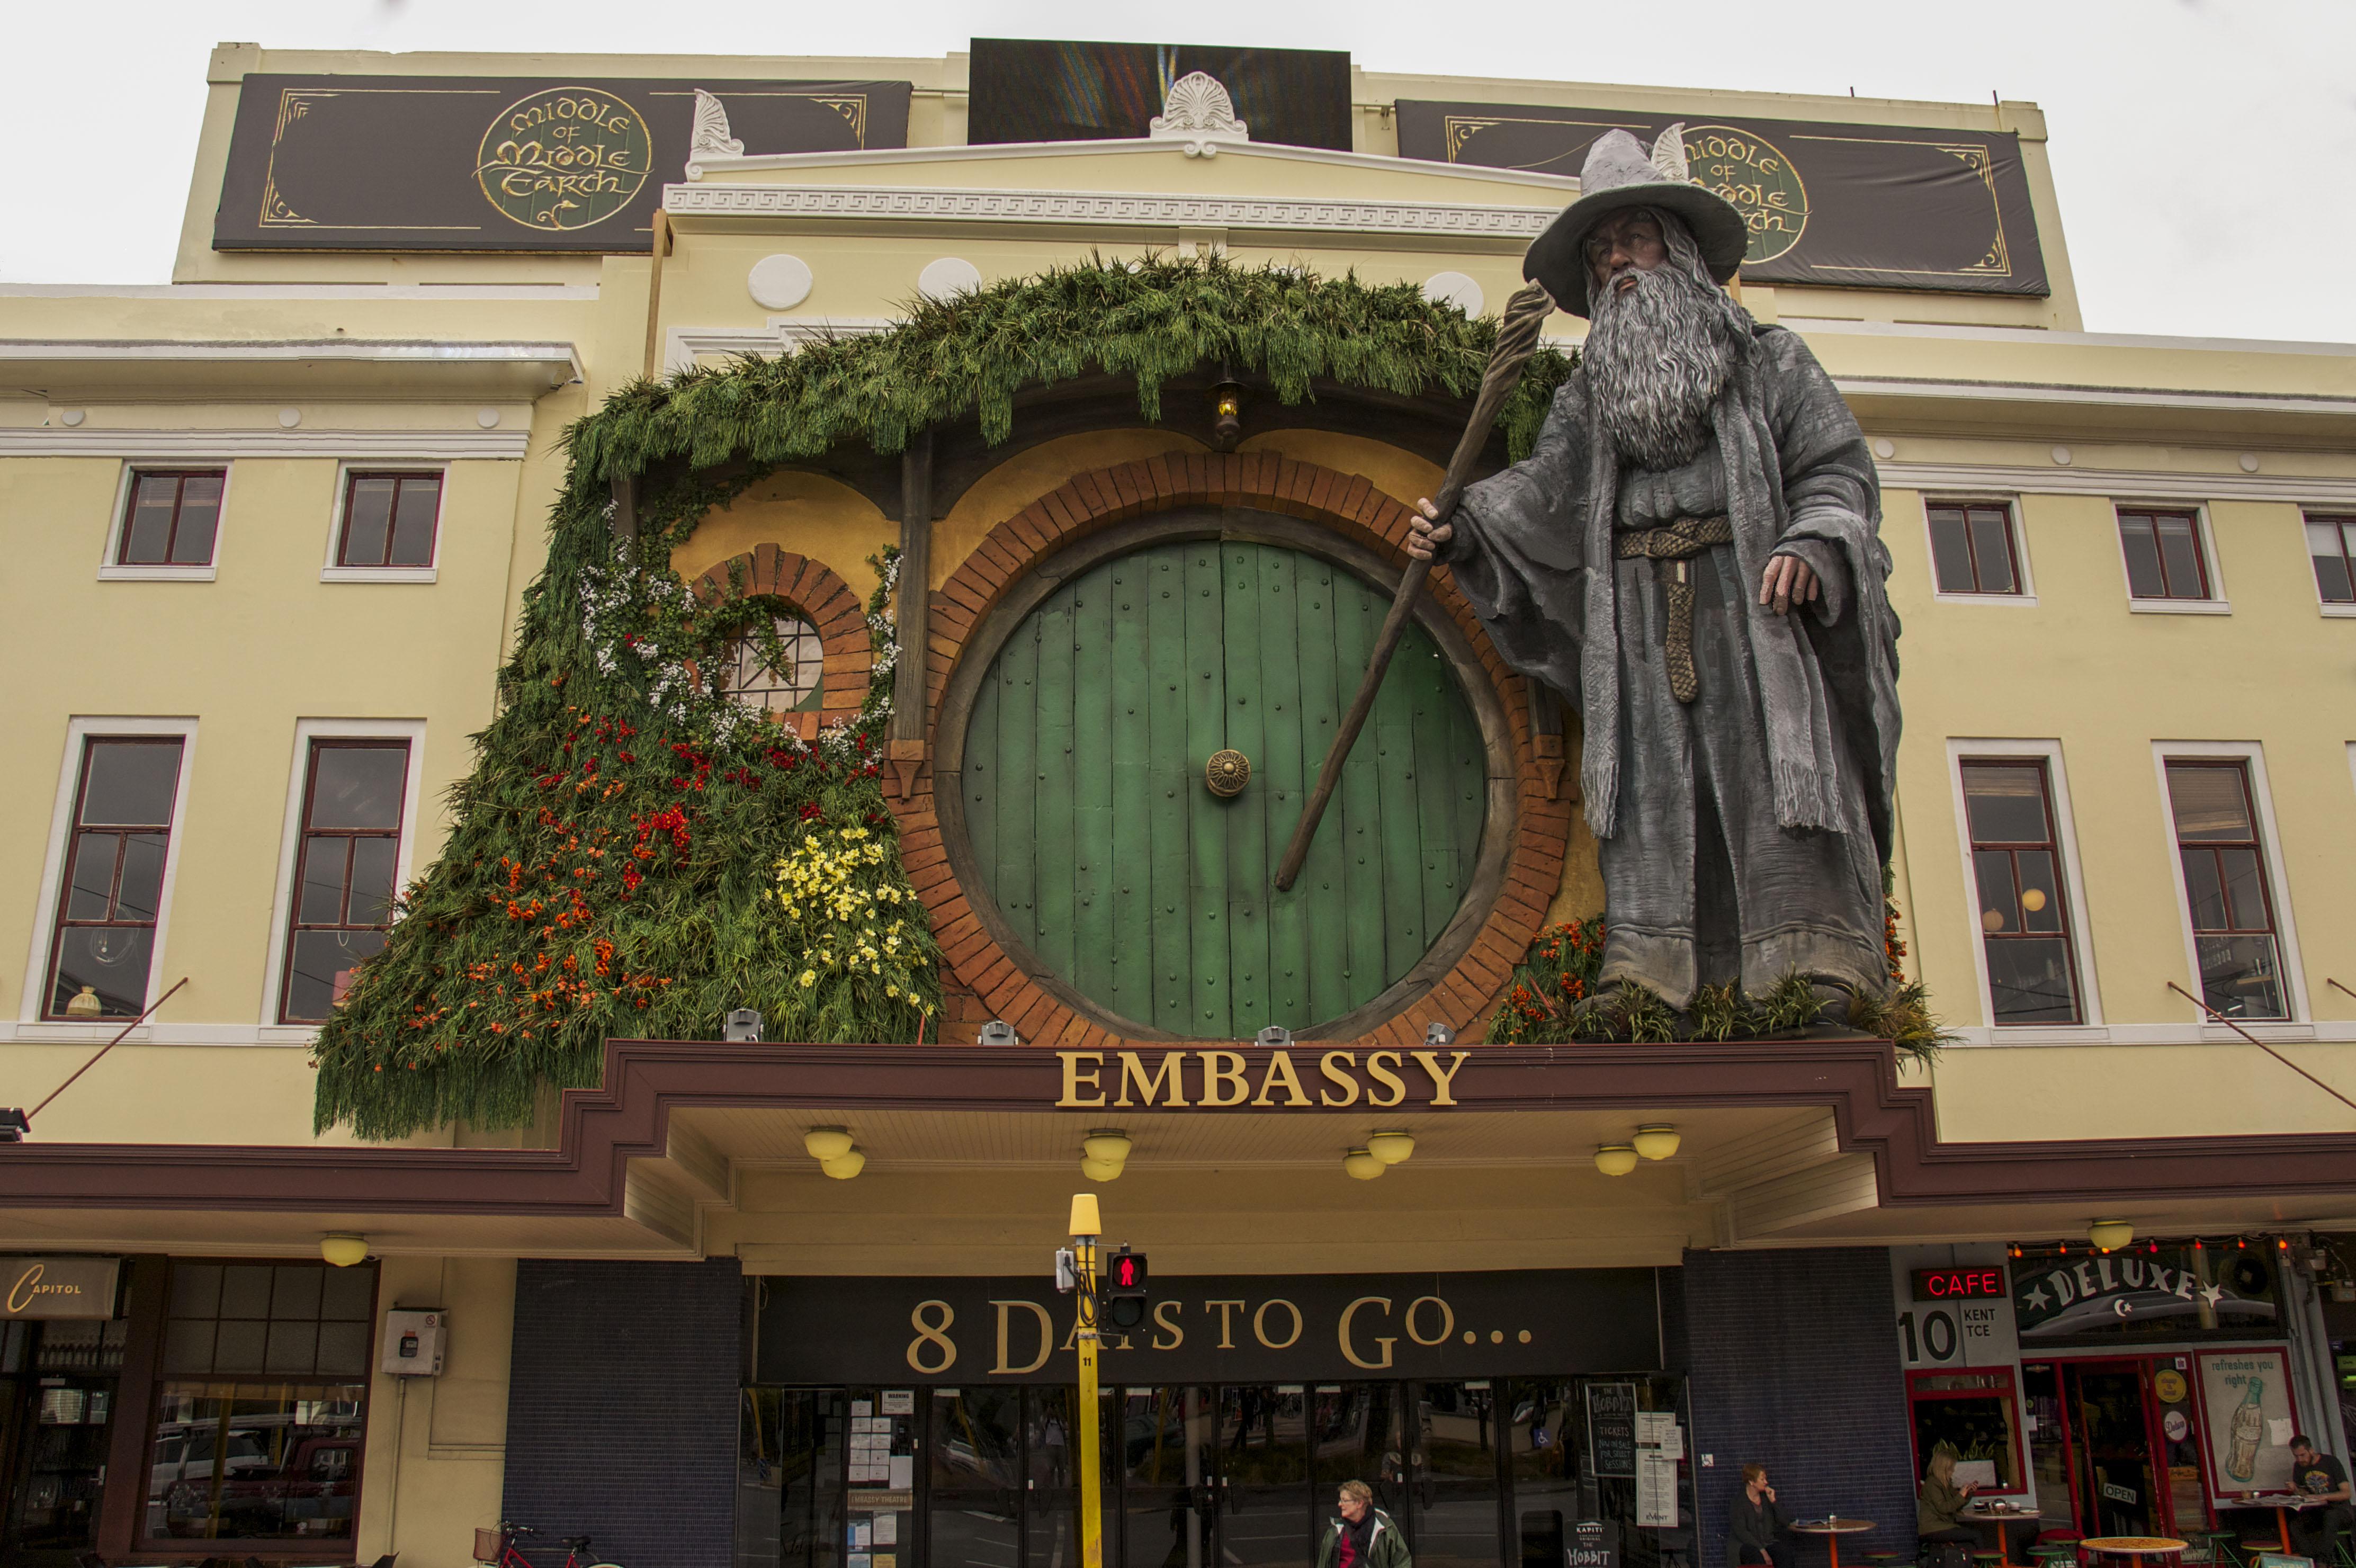 The theatre premiering The Hobbit film